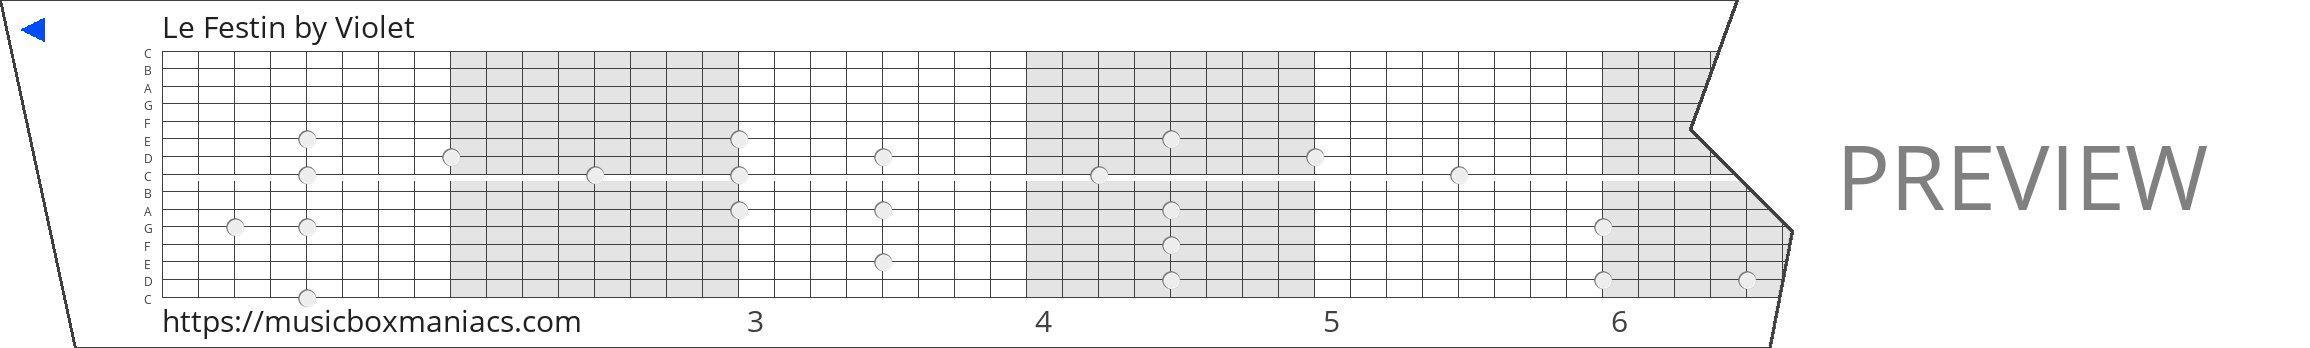 Le Festin 15 note music box paper strip